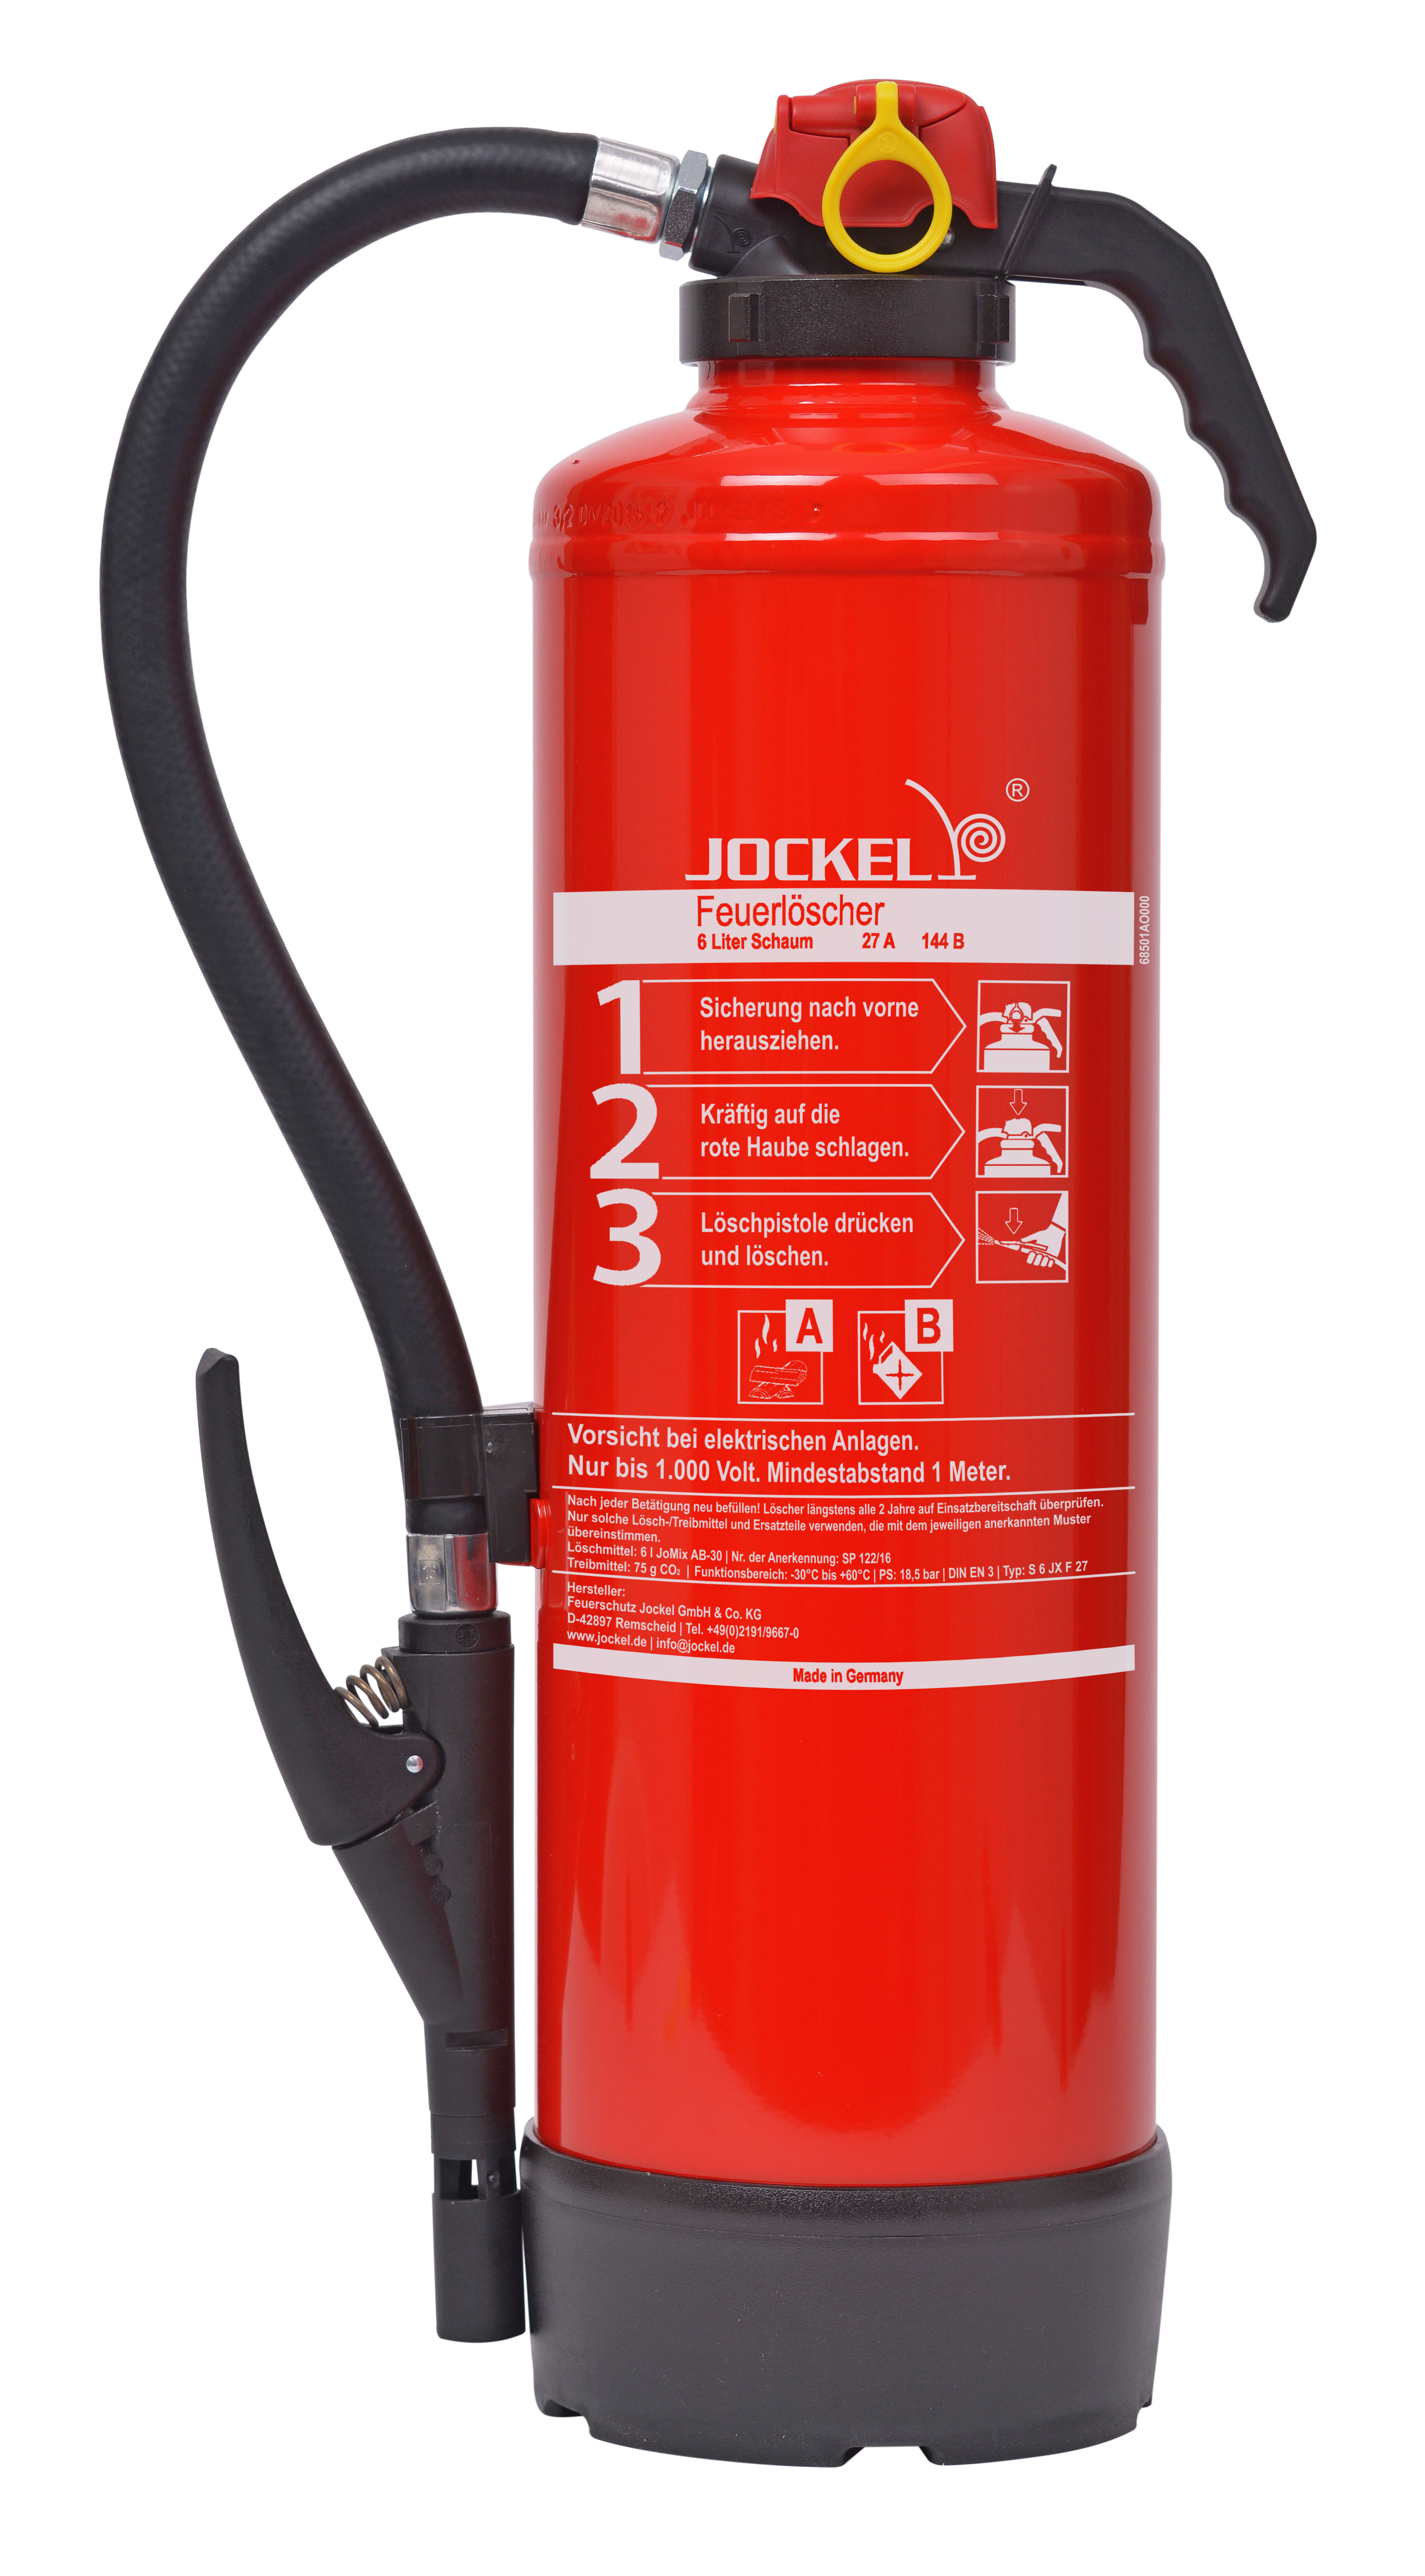 Jockel Feuerlöscher S 6 JX F 27 Classic